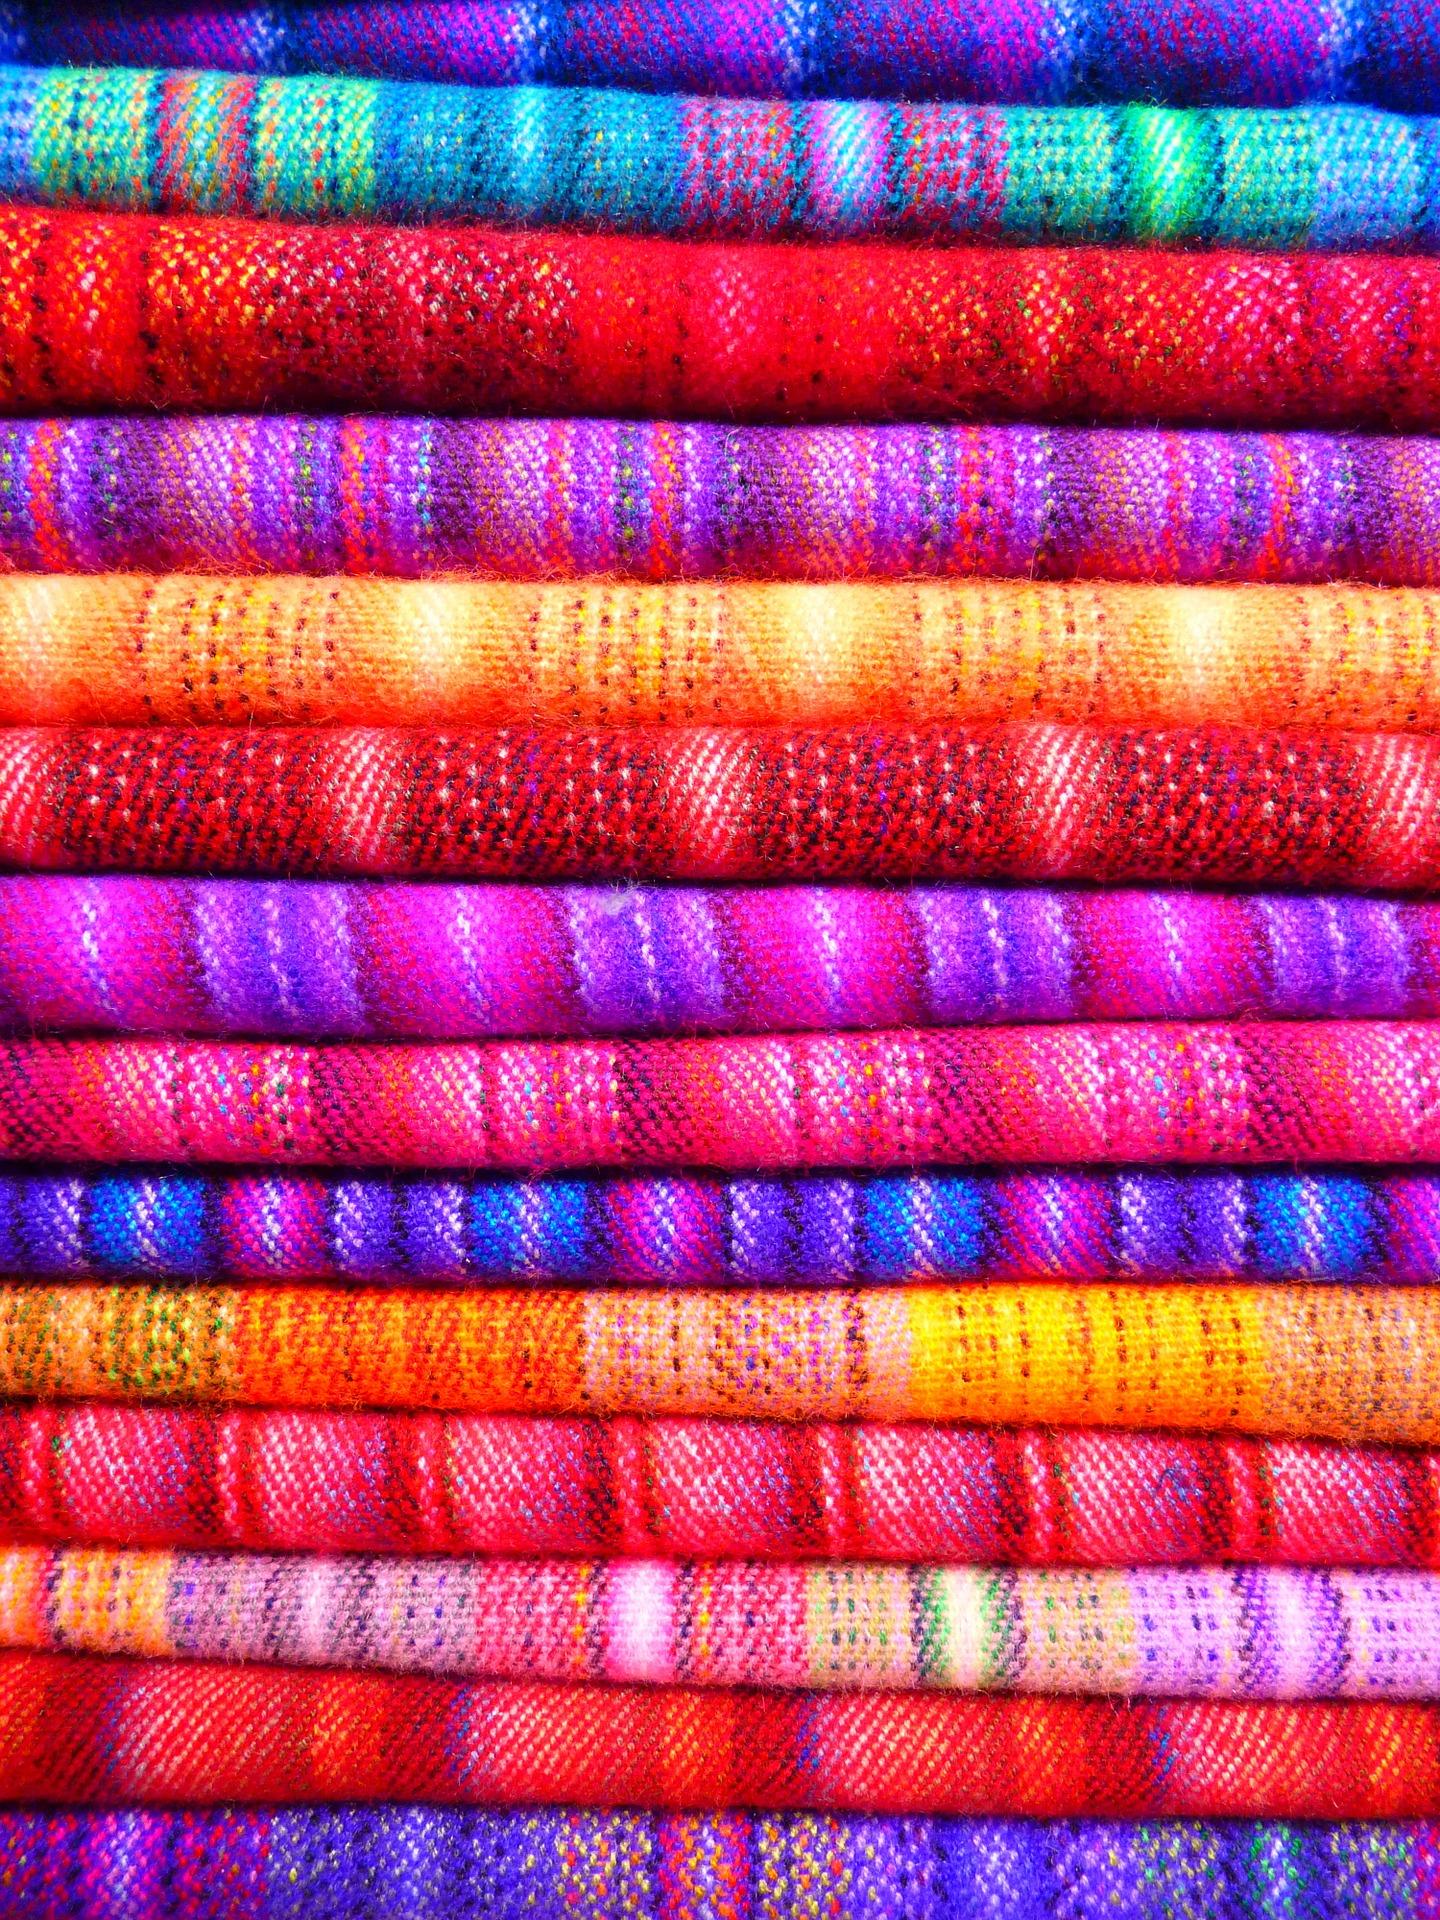 Stoffe, Farben, gefärbt, Kleidung, legt fest - Wallpaper HD - Prof.-falken.com